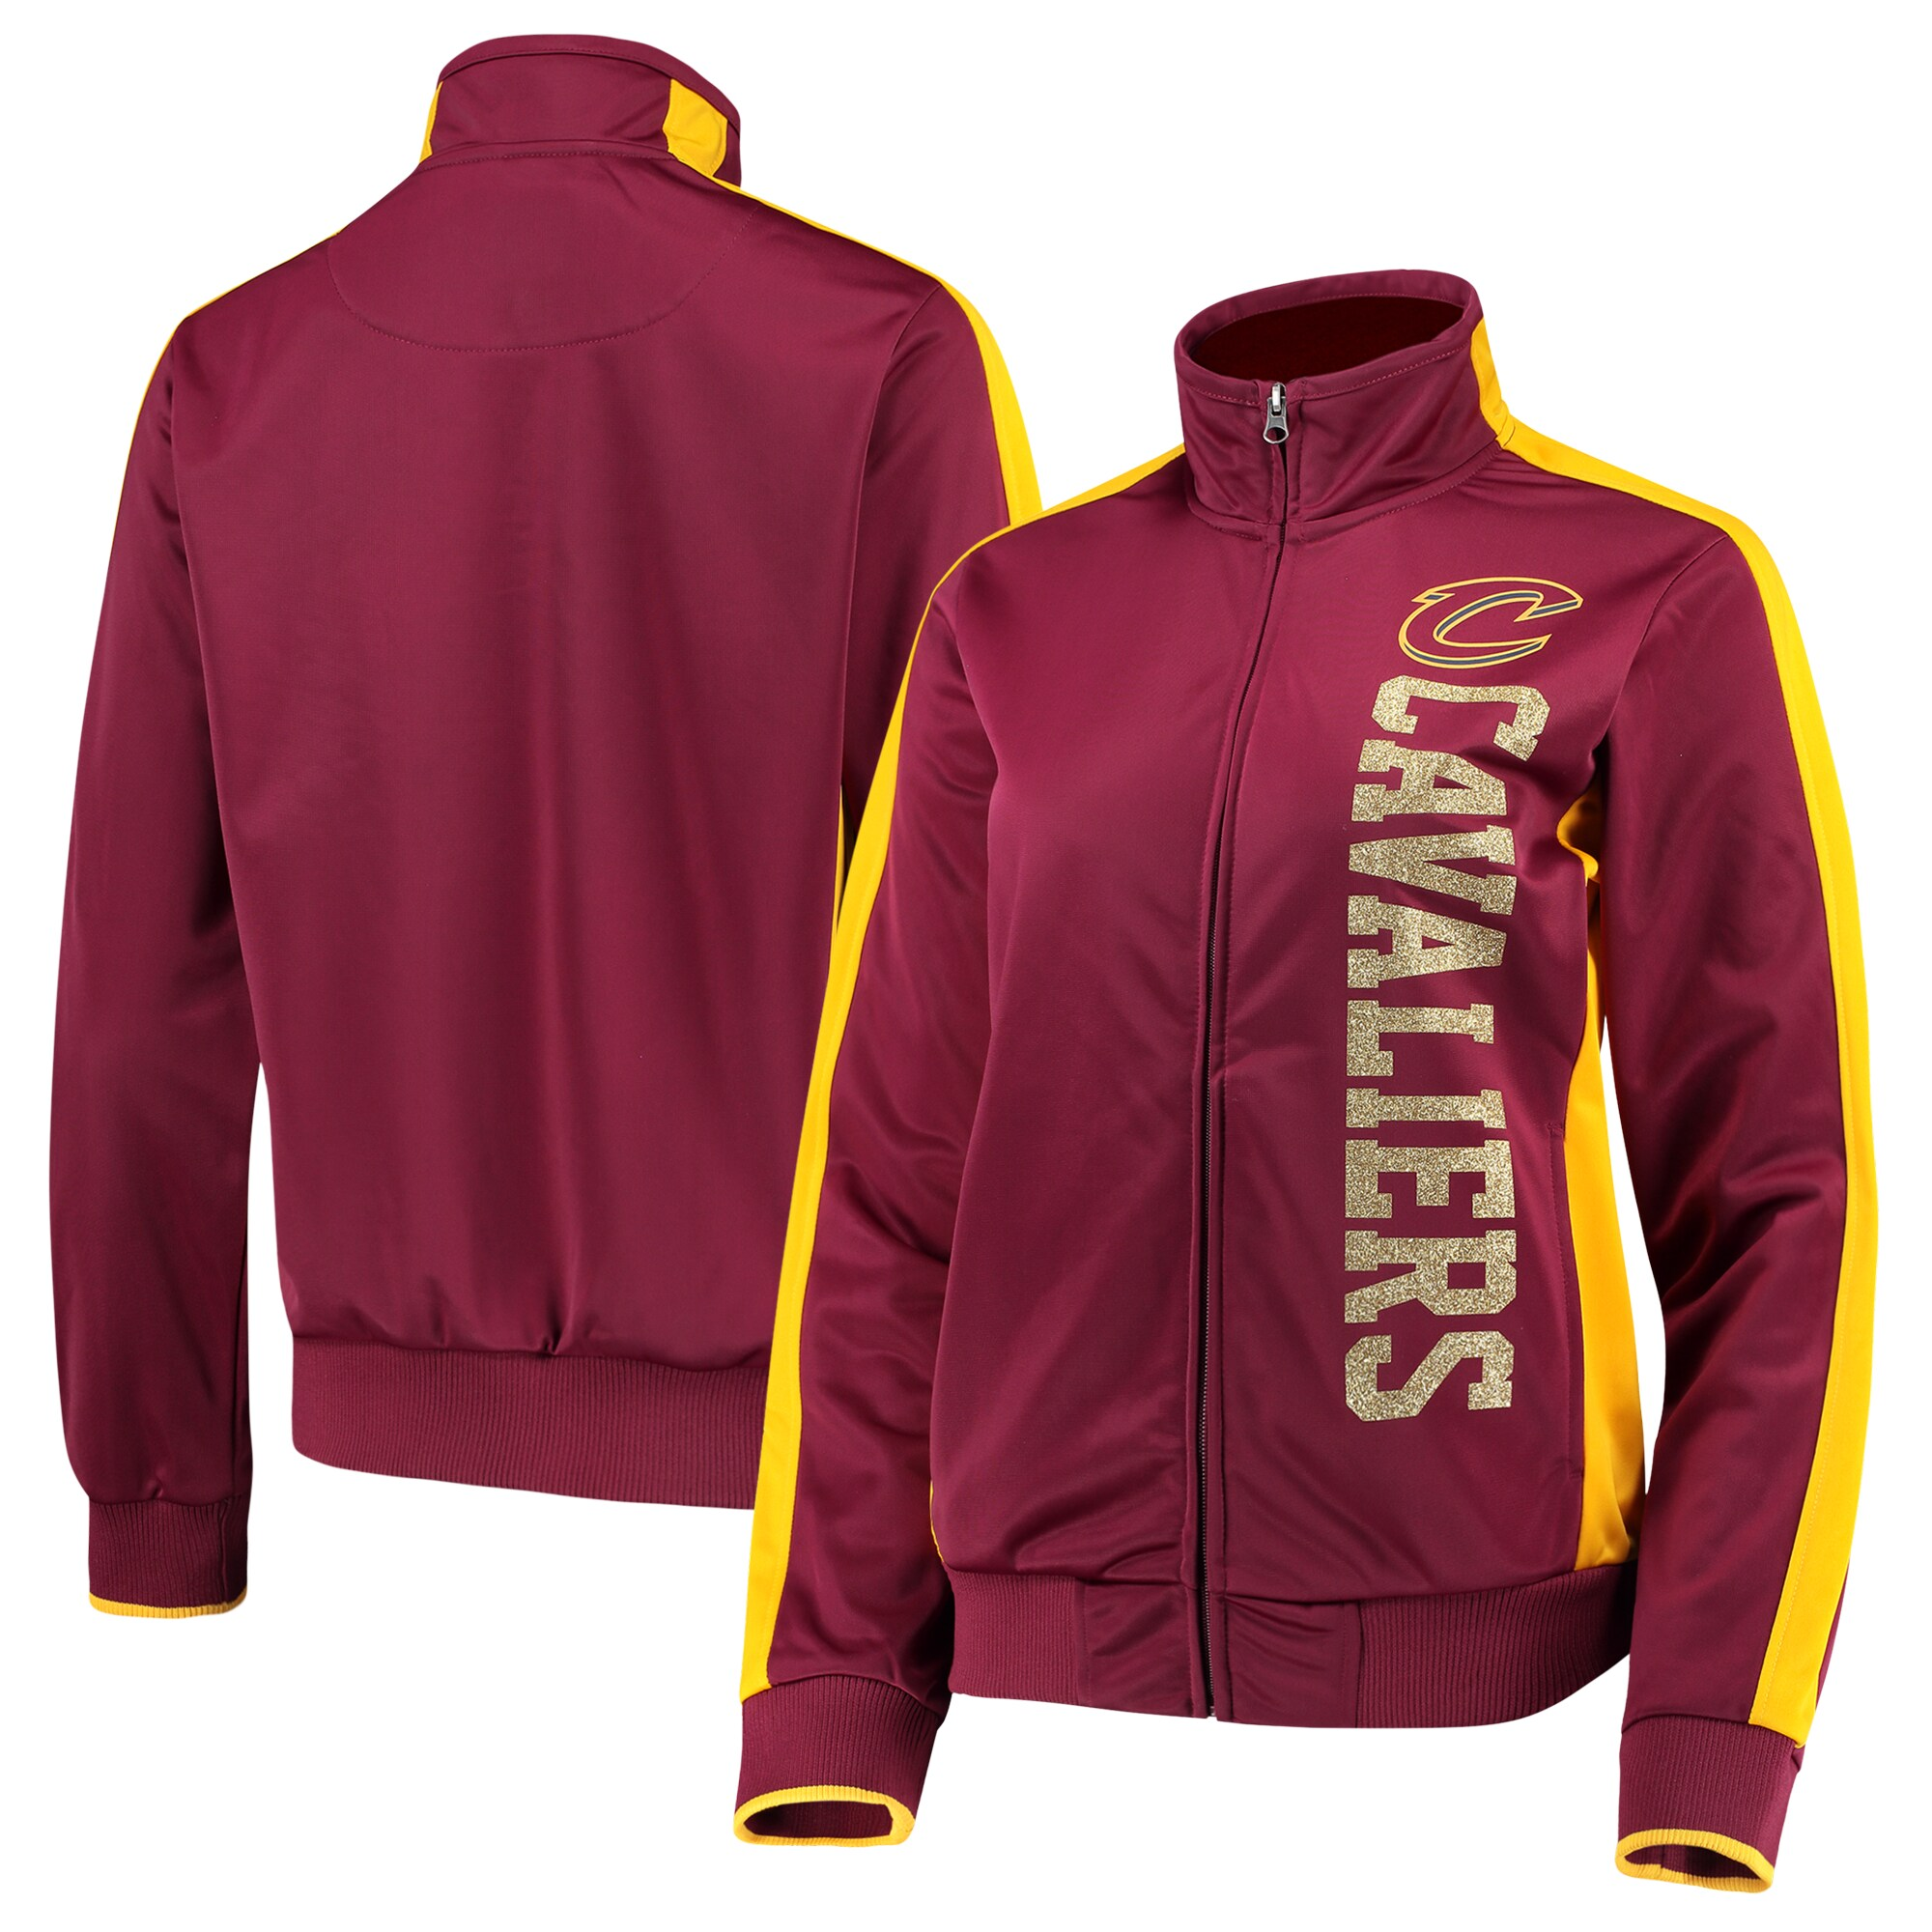 Cleveland Cavaliers G-III 4Her by Carl Banks Women's Drop Back Full-Zip Track Jacket - Wine